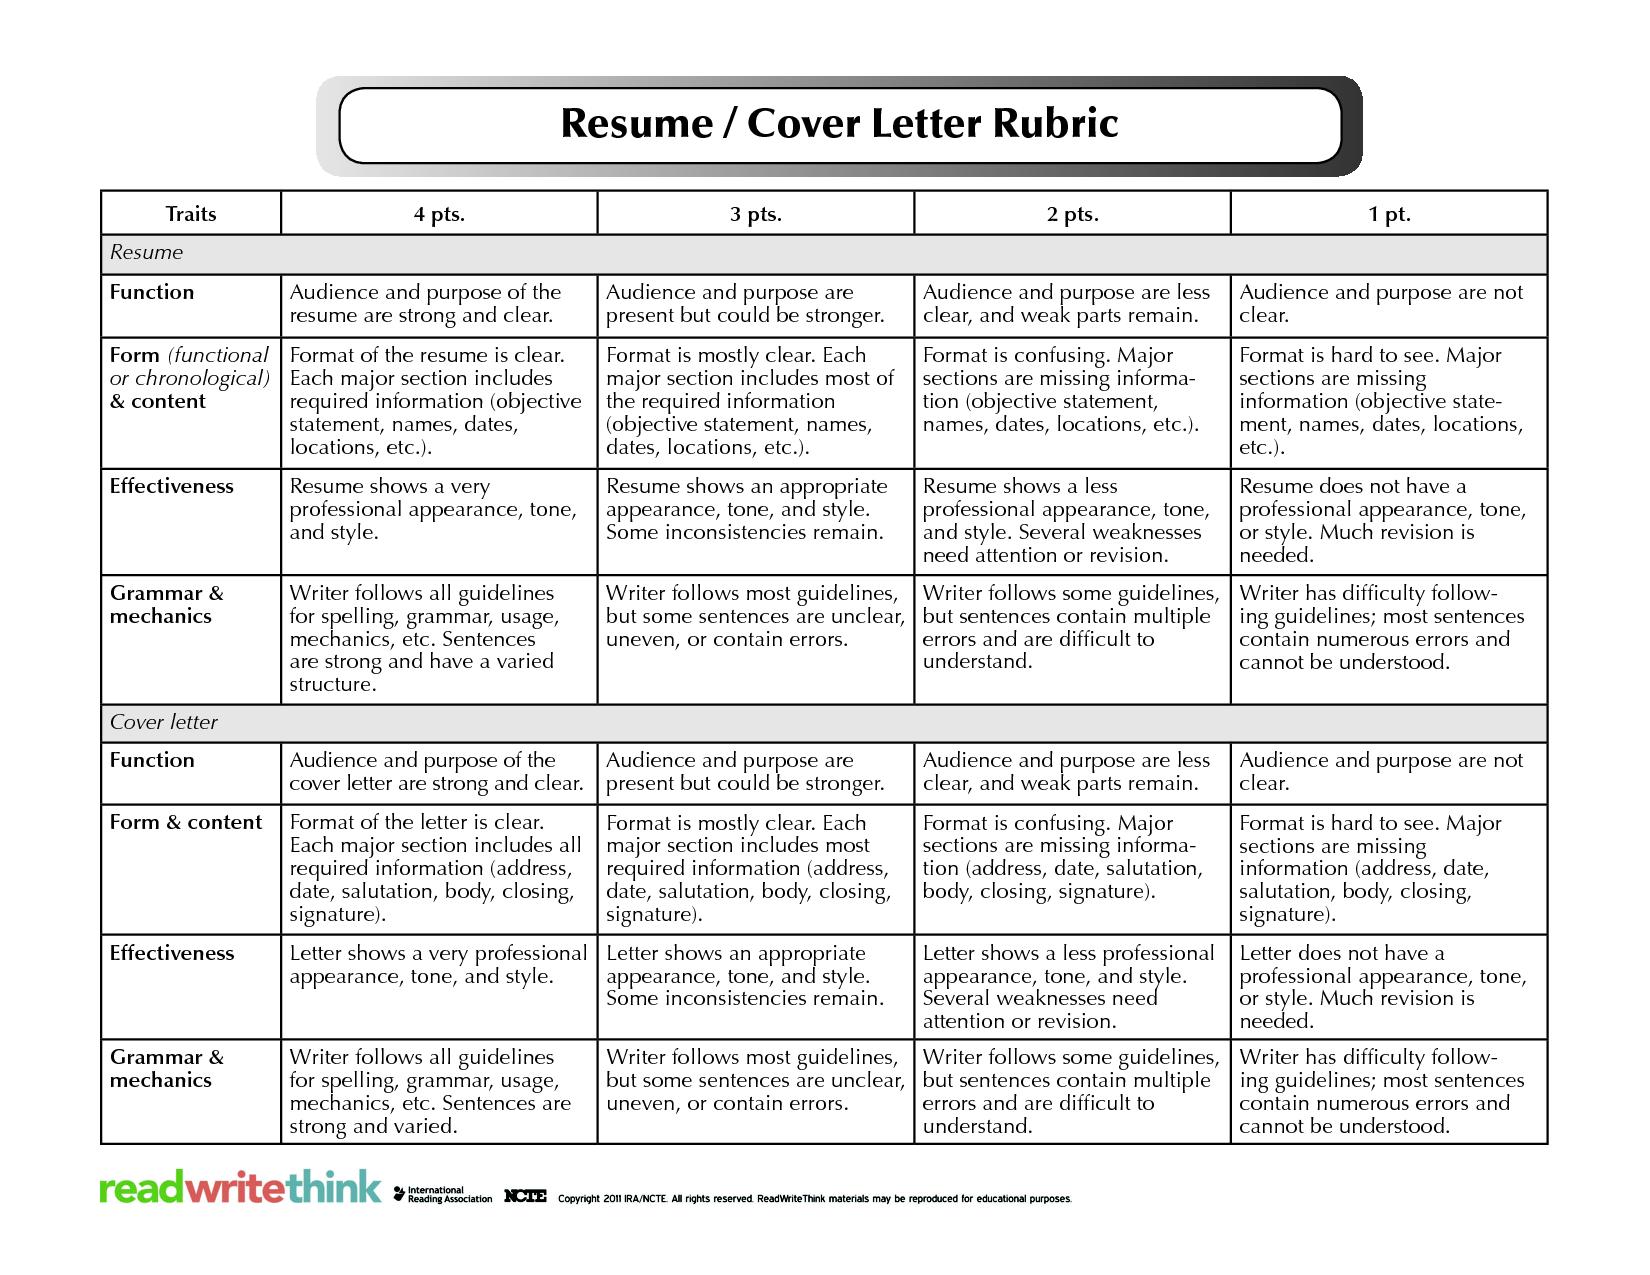 35++ National resume writers association australia Resume Examples